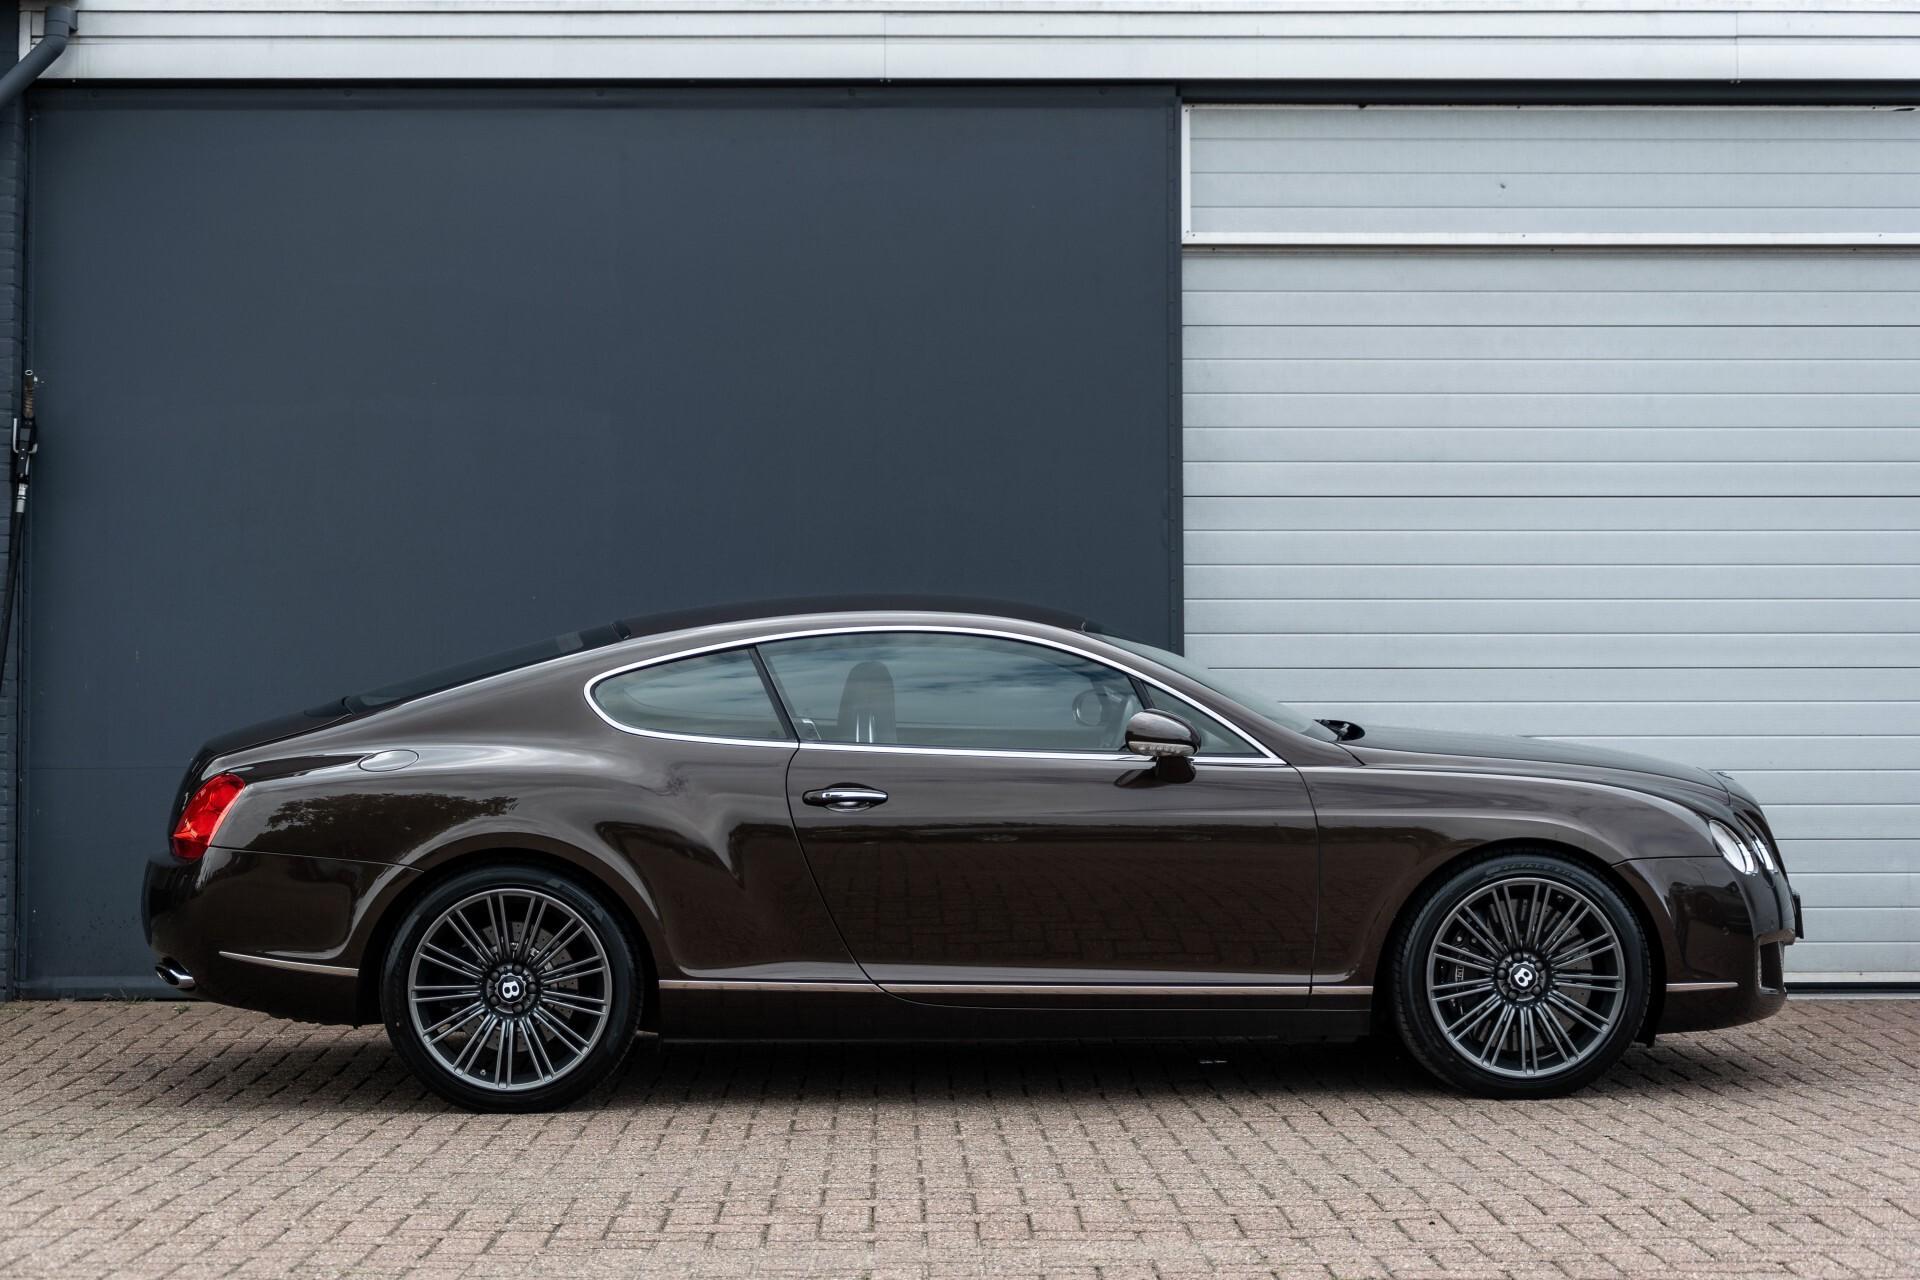 Bentley Continental GT 6.0 W12 GT Speed Ceramic Brakes/Mulliner/Standkachel/Keyless Aut6 Foto 54